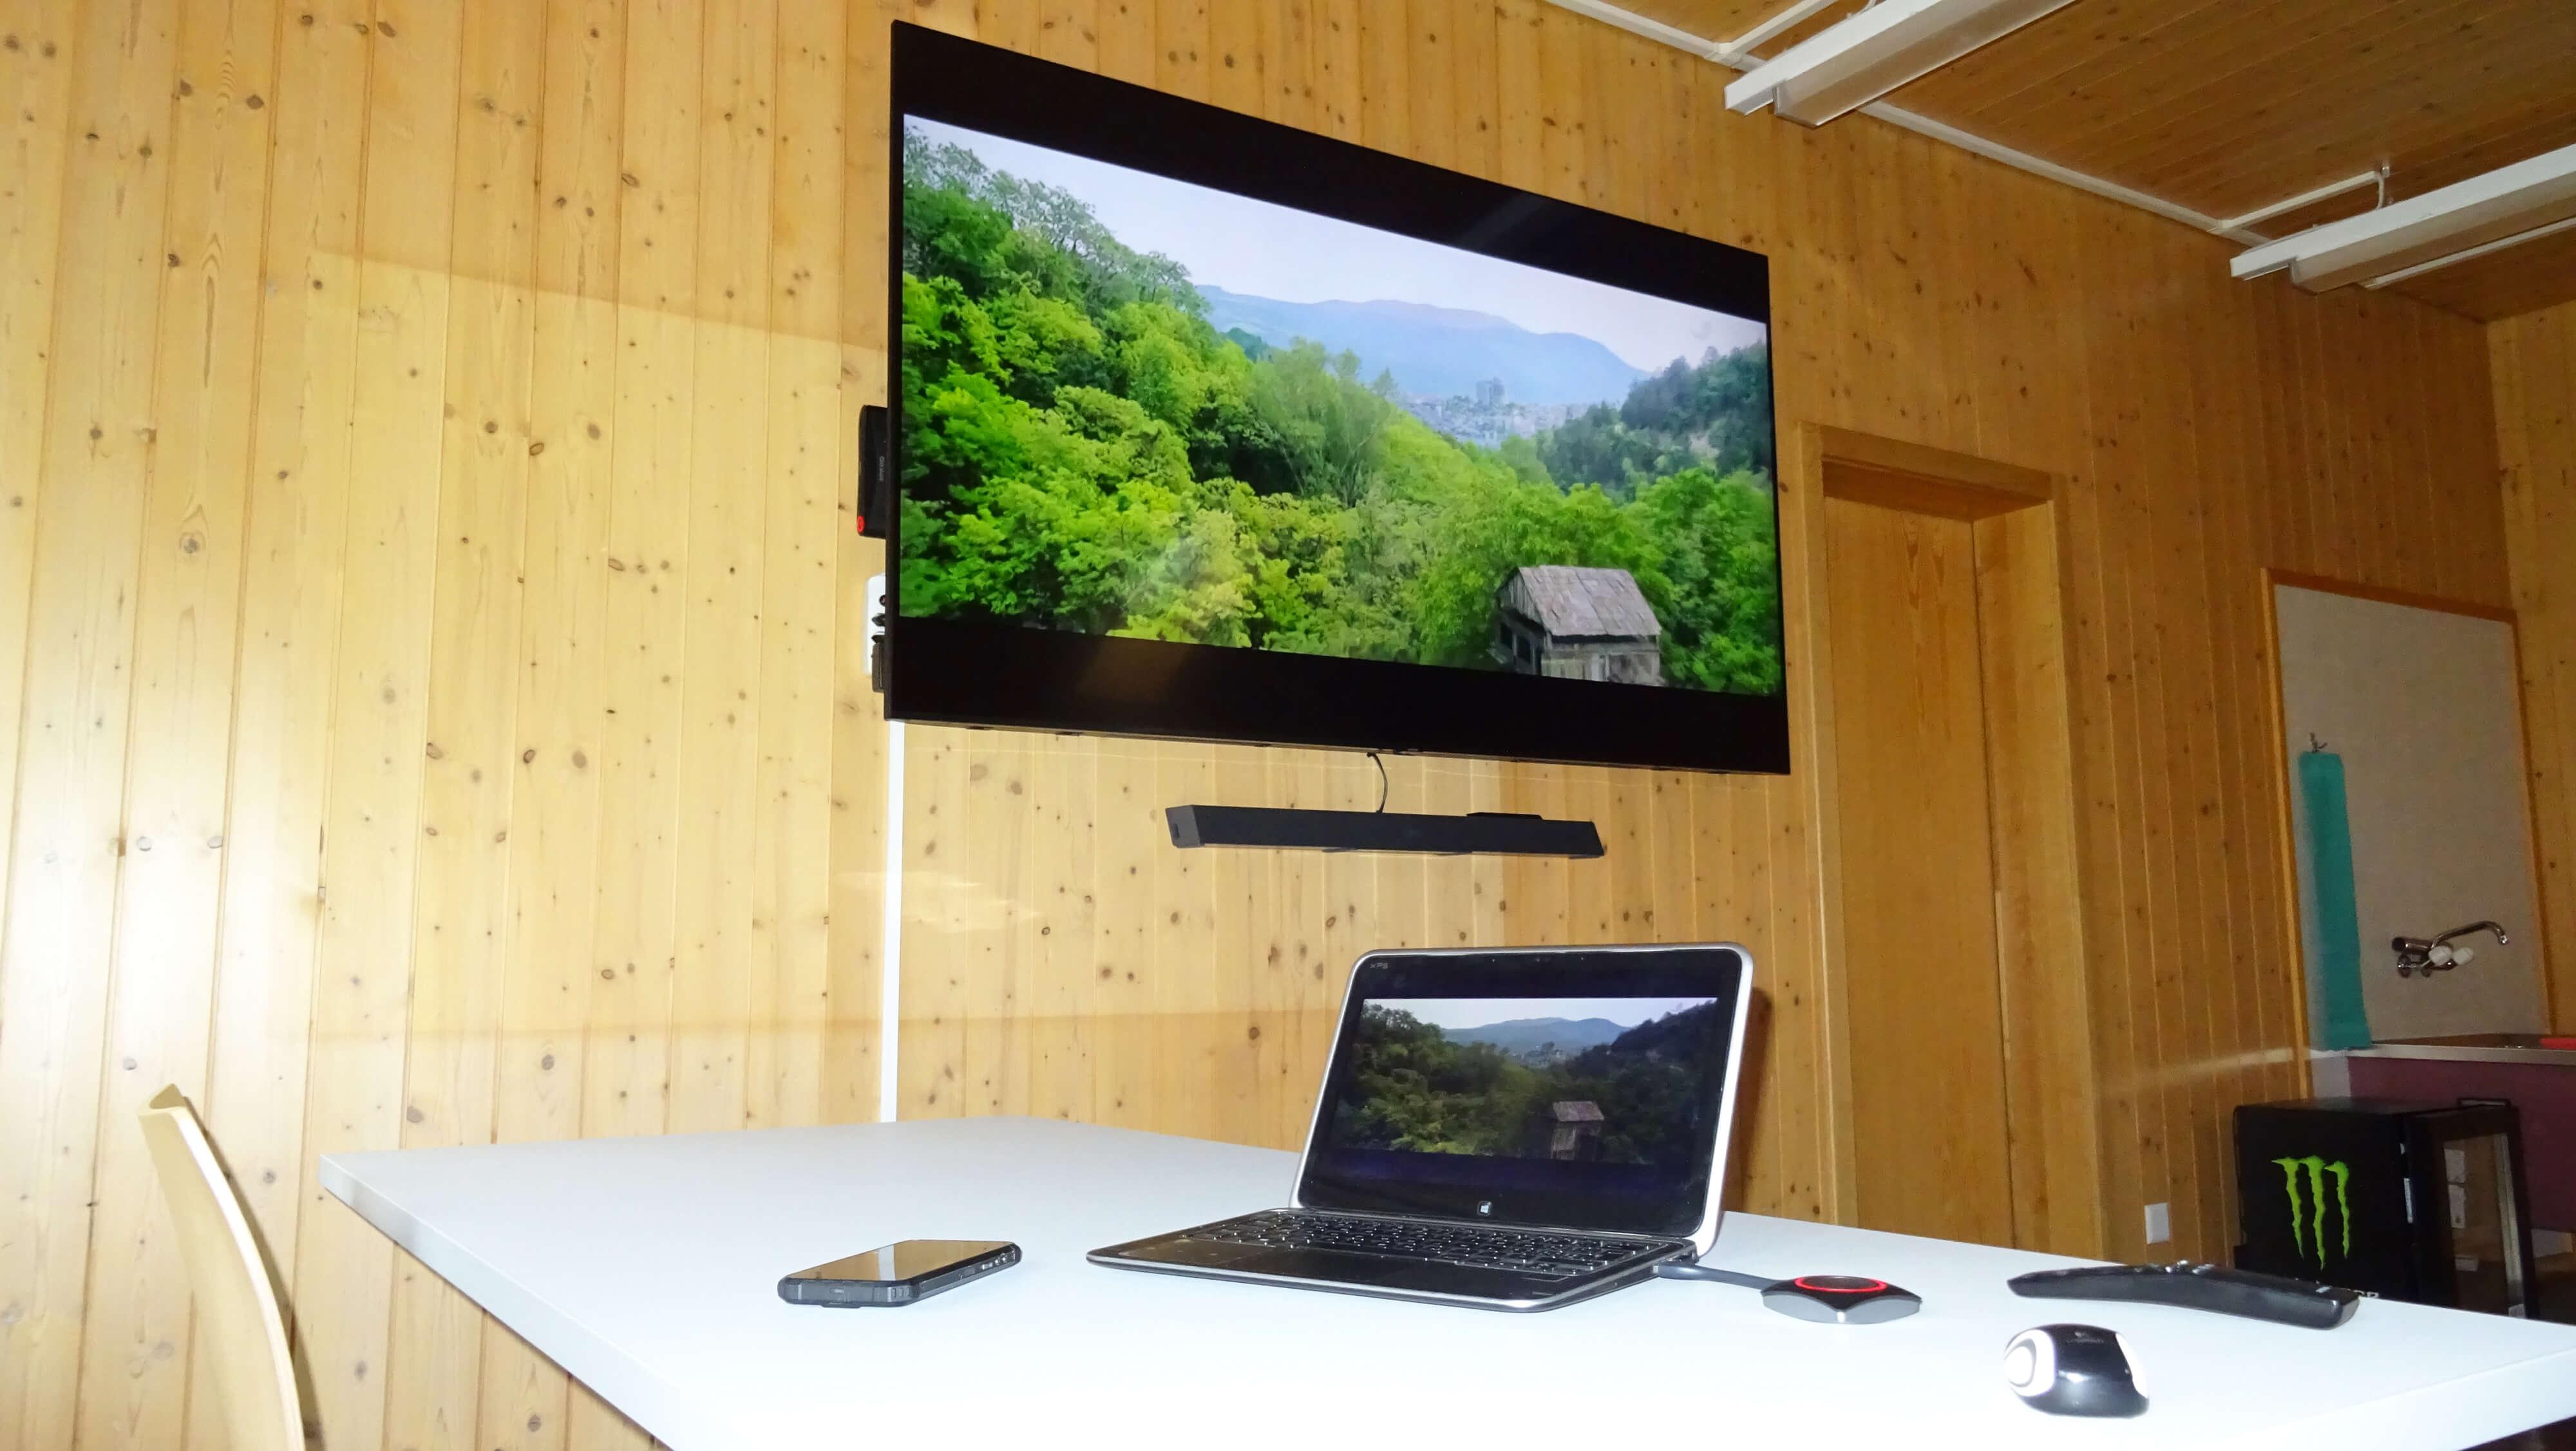 Barco Präsentationssystem im Seminarraum Süd